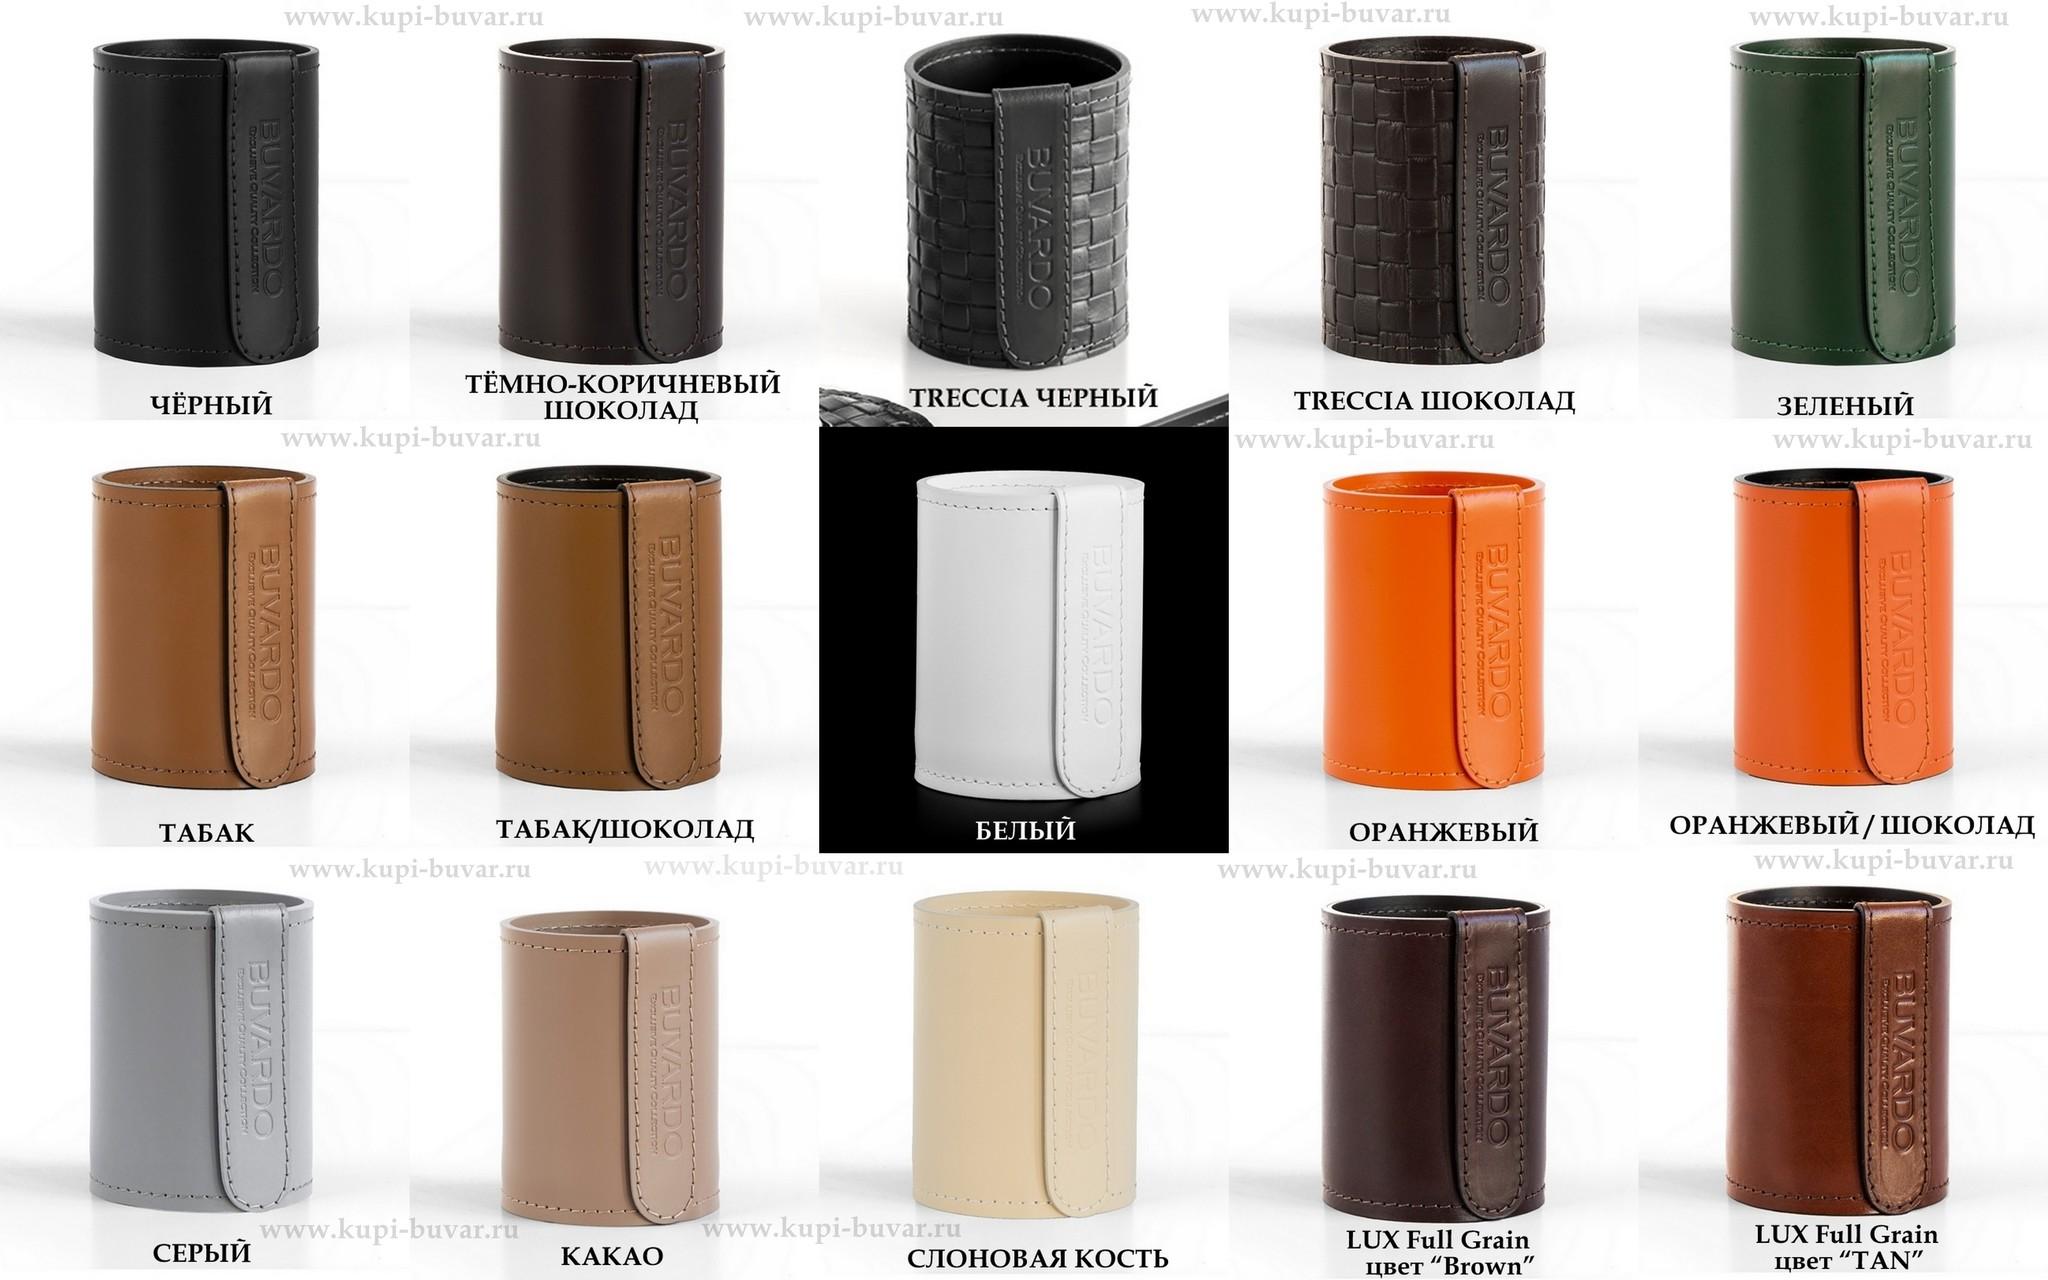 Варианты цвета кожи Cuoietto для набора 1774-СТ 24 предмета.